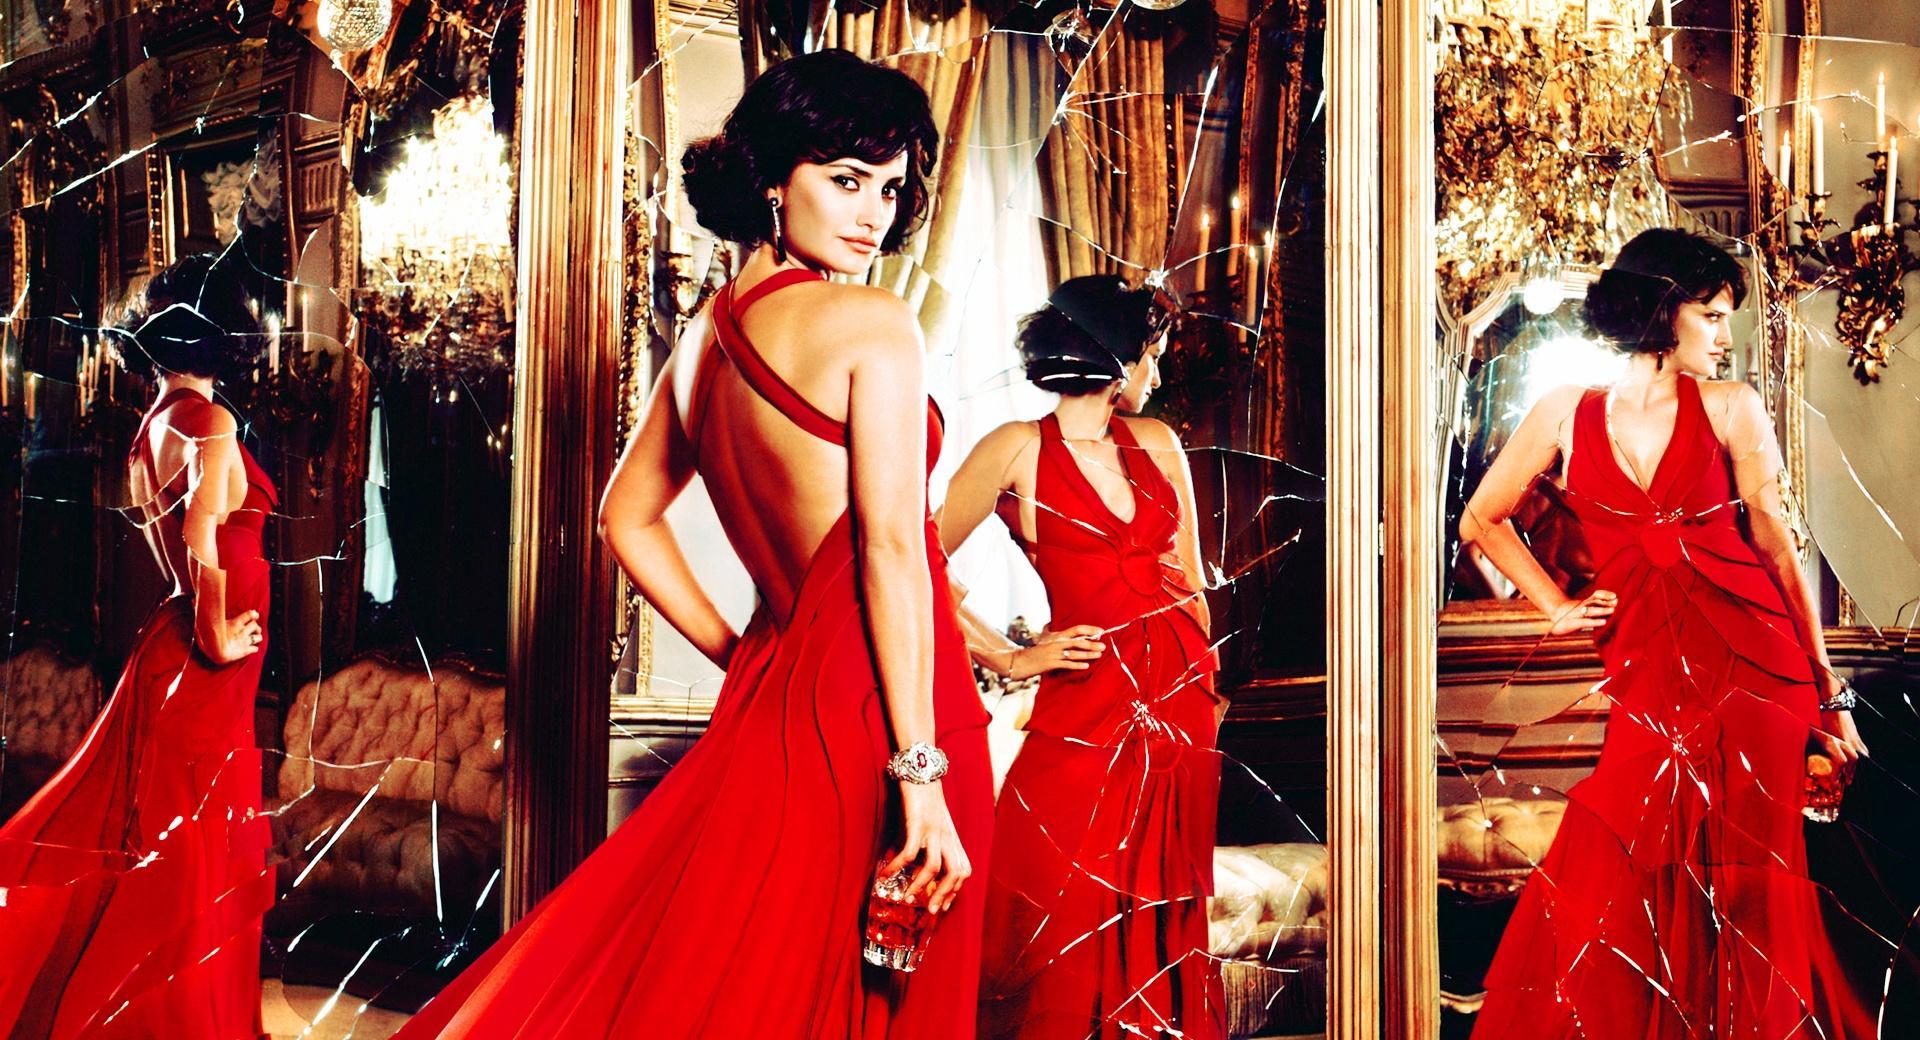 Penelope Cruz Glamorous wallpapers HD quality